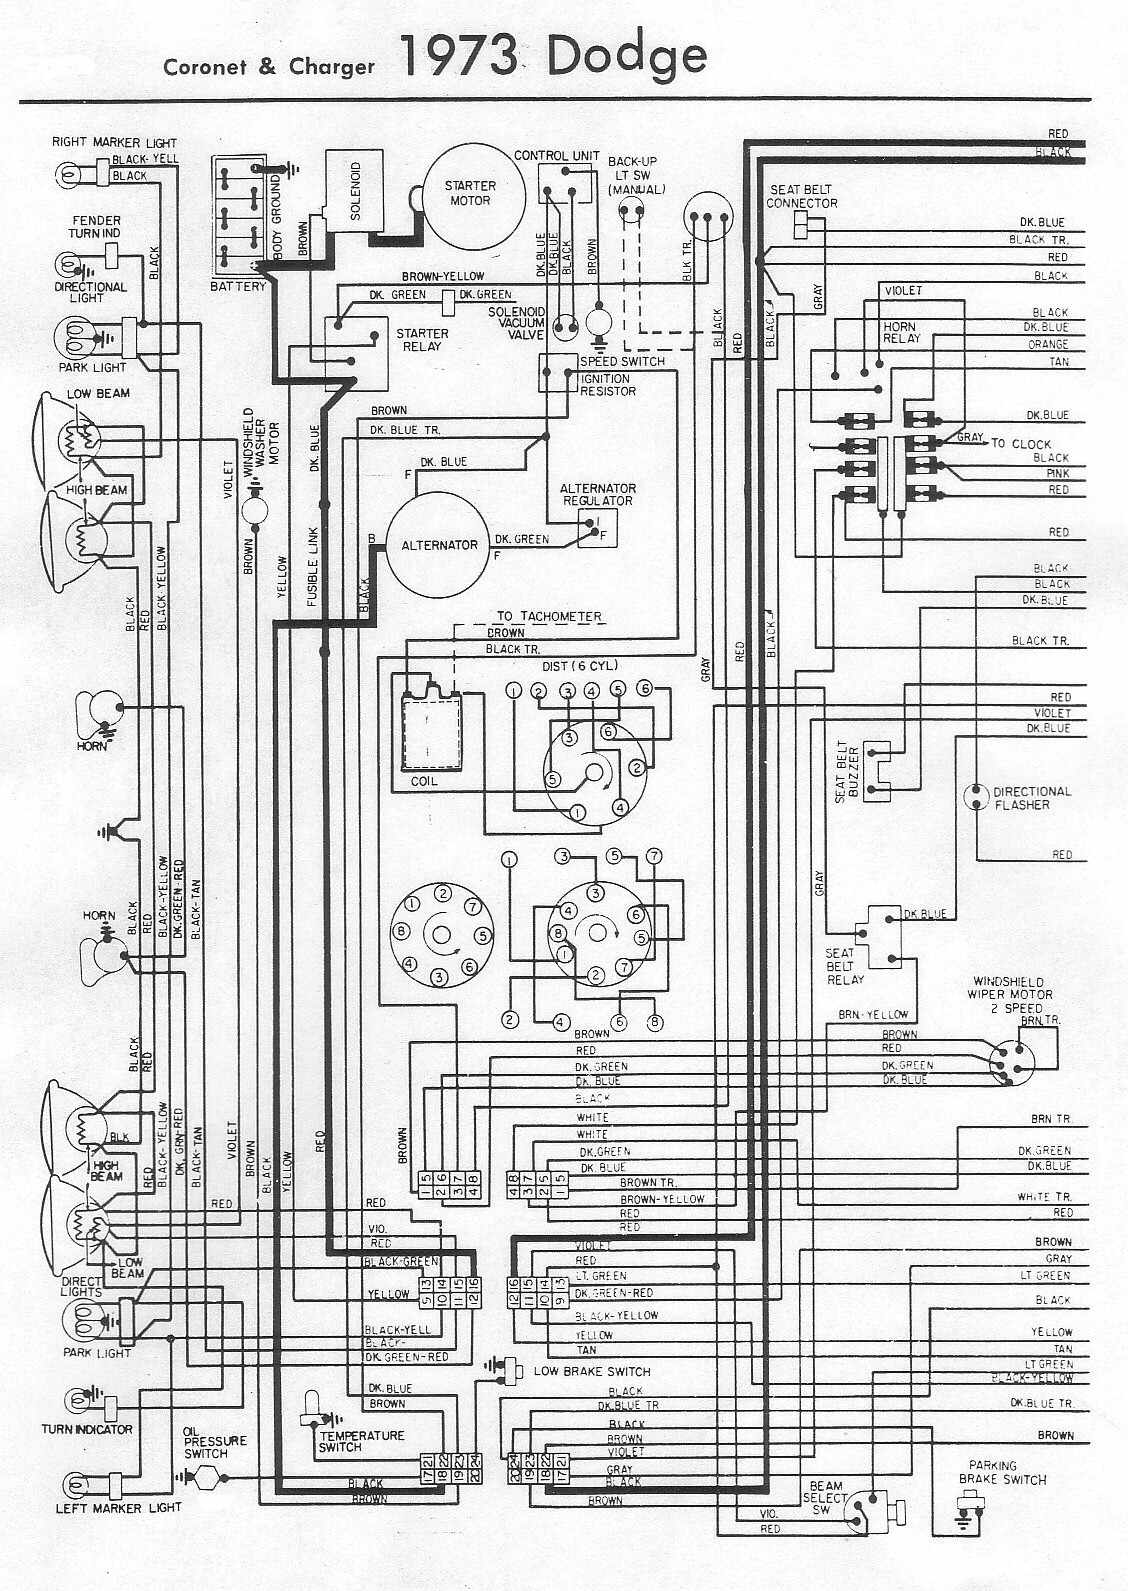 4age Wiring Diagram Home Run Wiring For Door Sensors